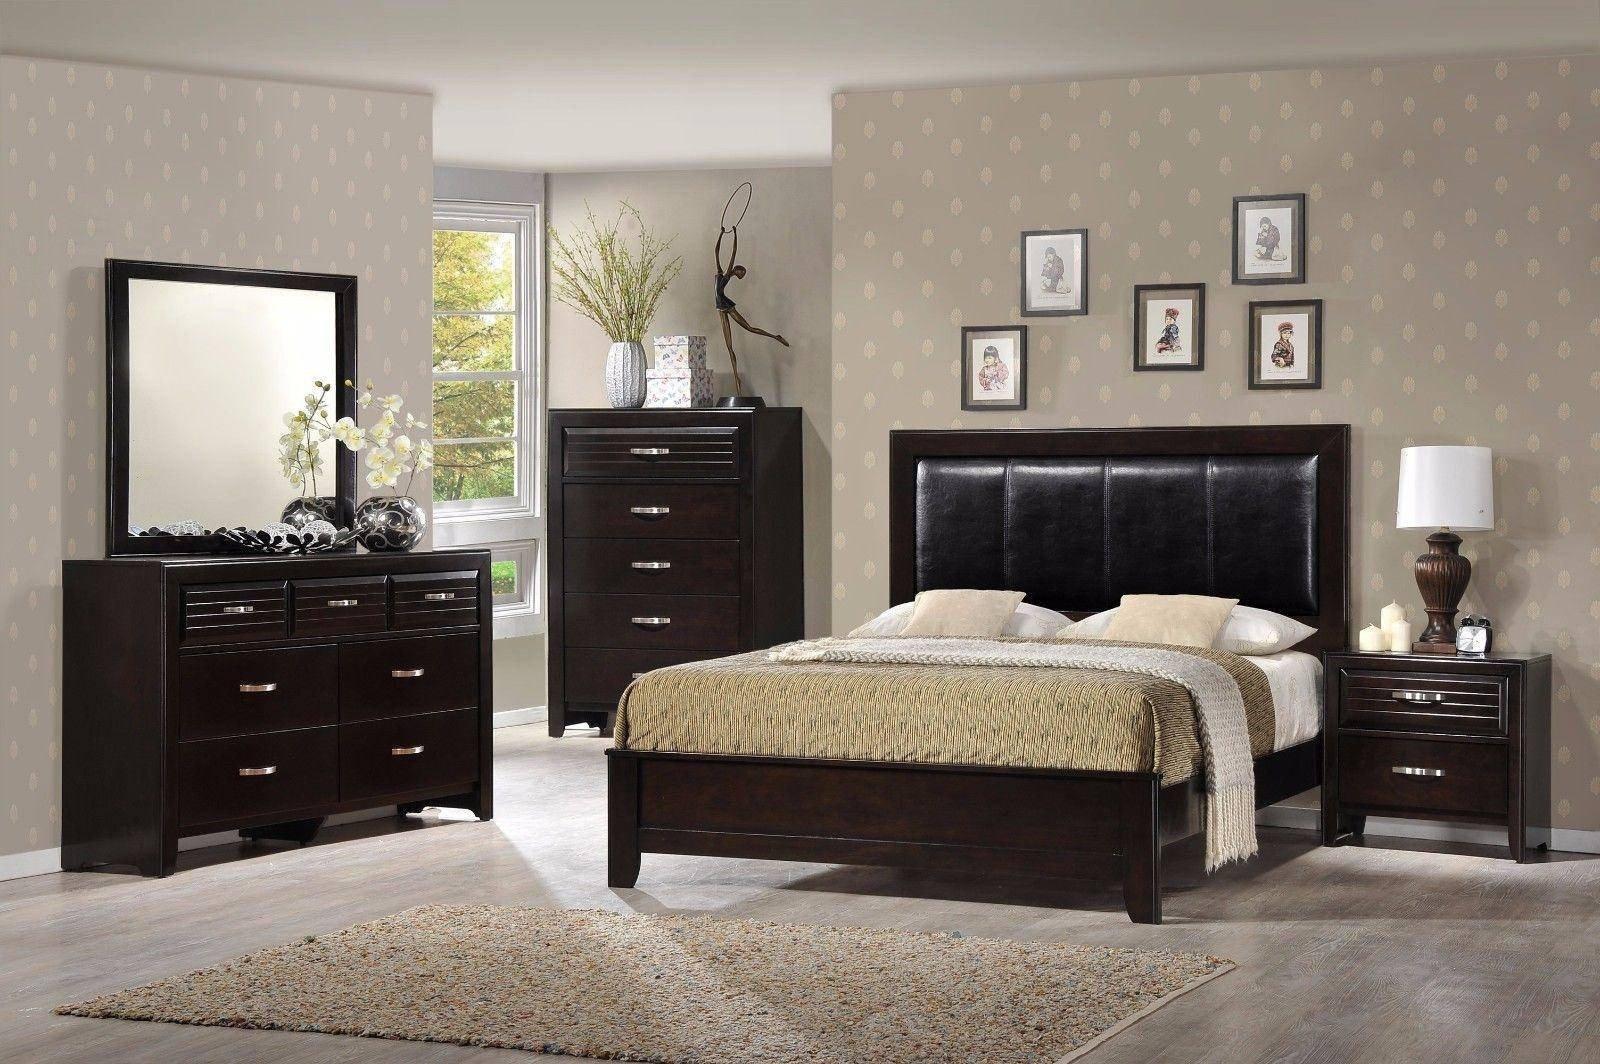 Solid Wood Bedroom Set Luxury Crown Mark B7400 Jocelyn Dark Espresso solid Wood King Size Bedroom Set 3pcs